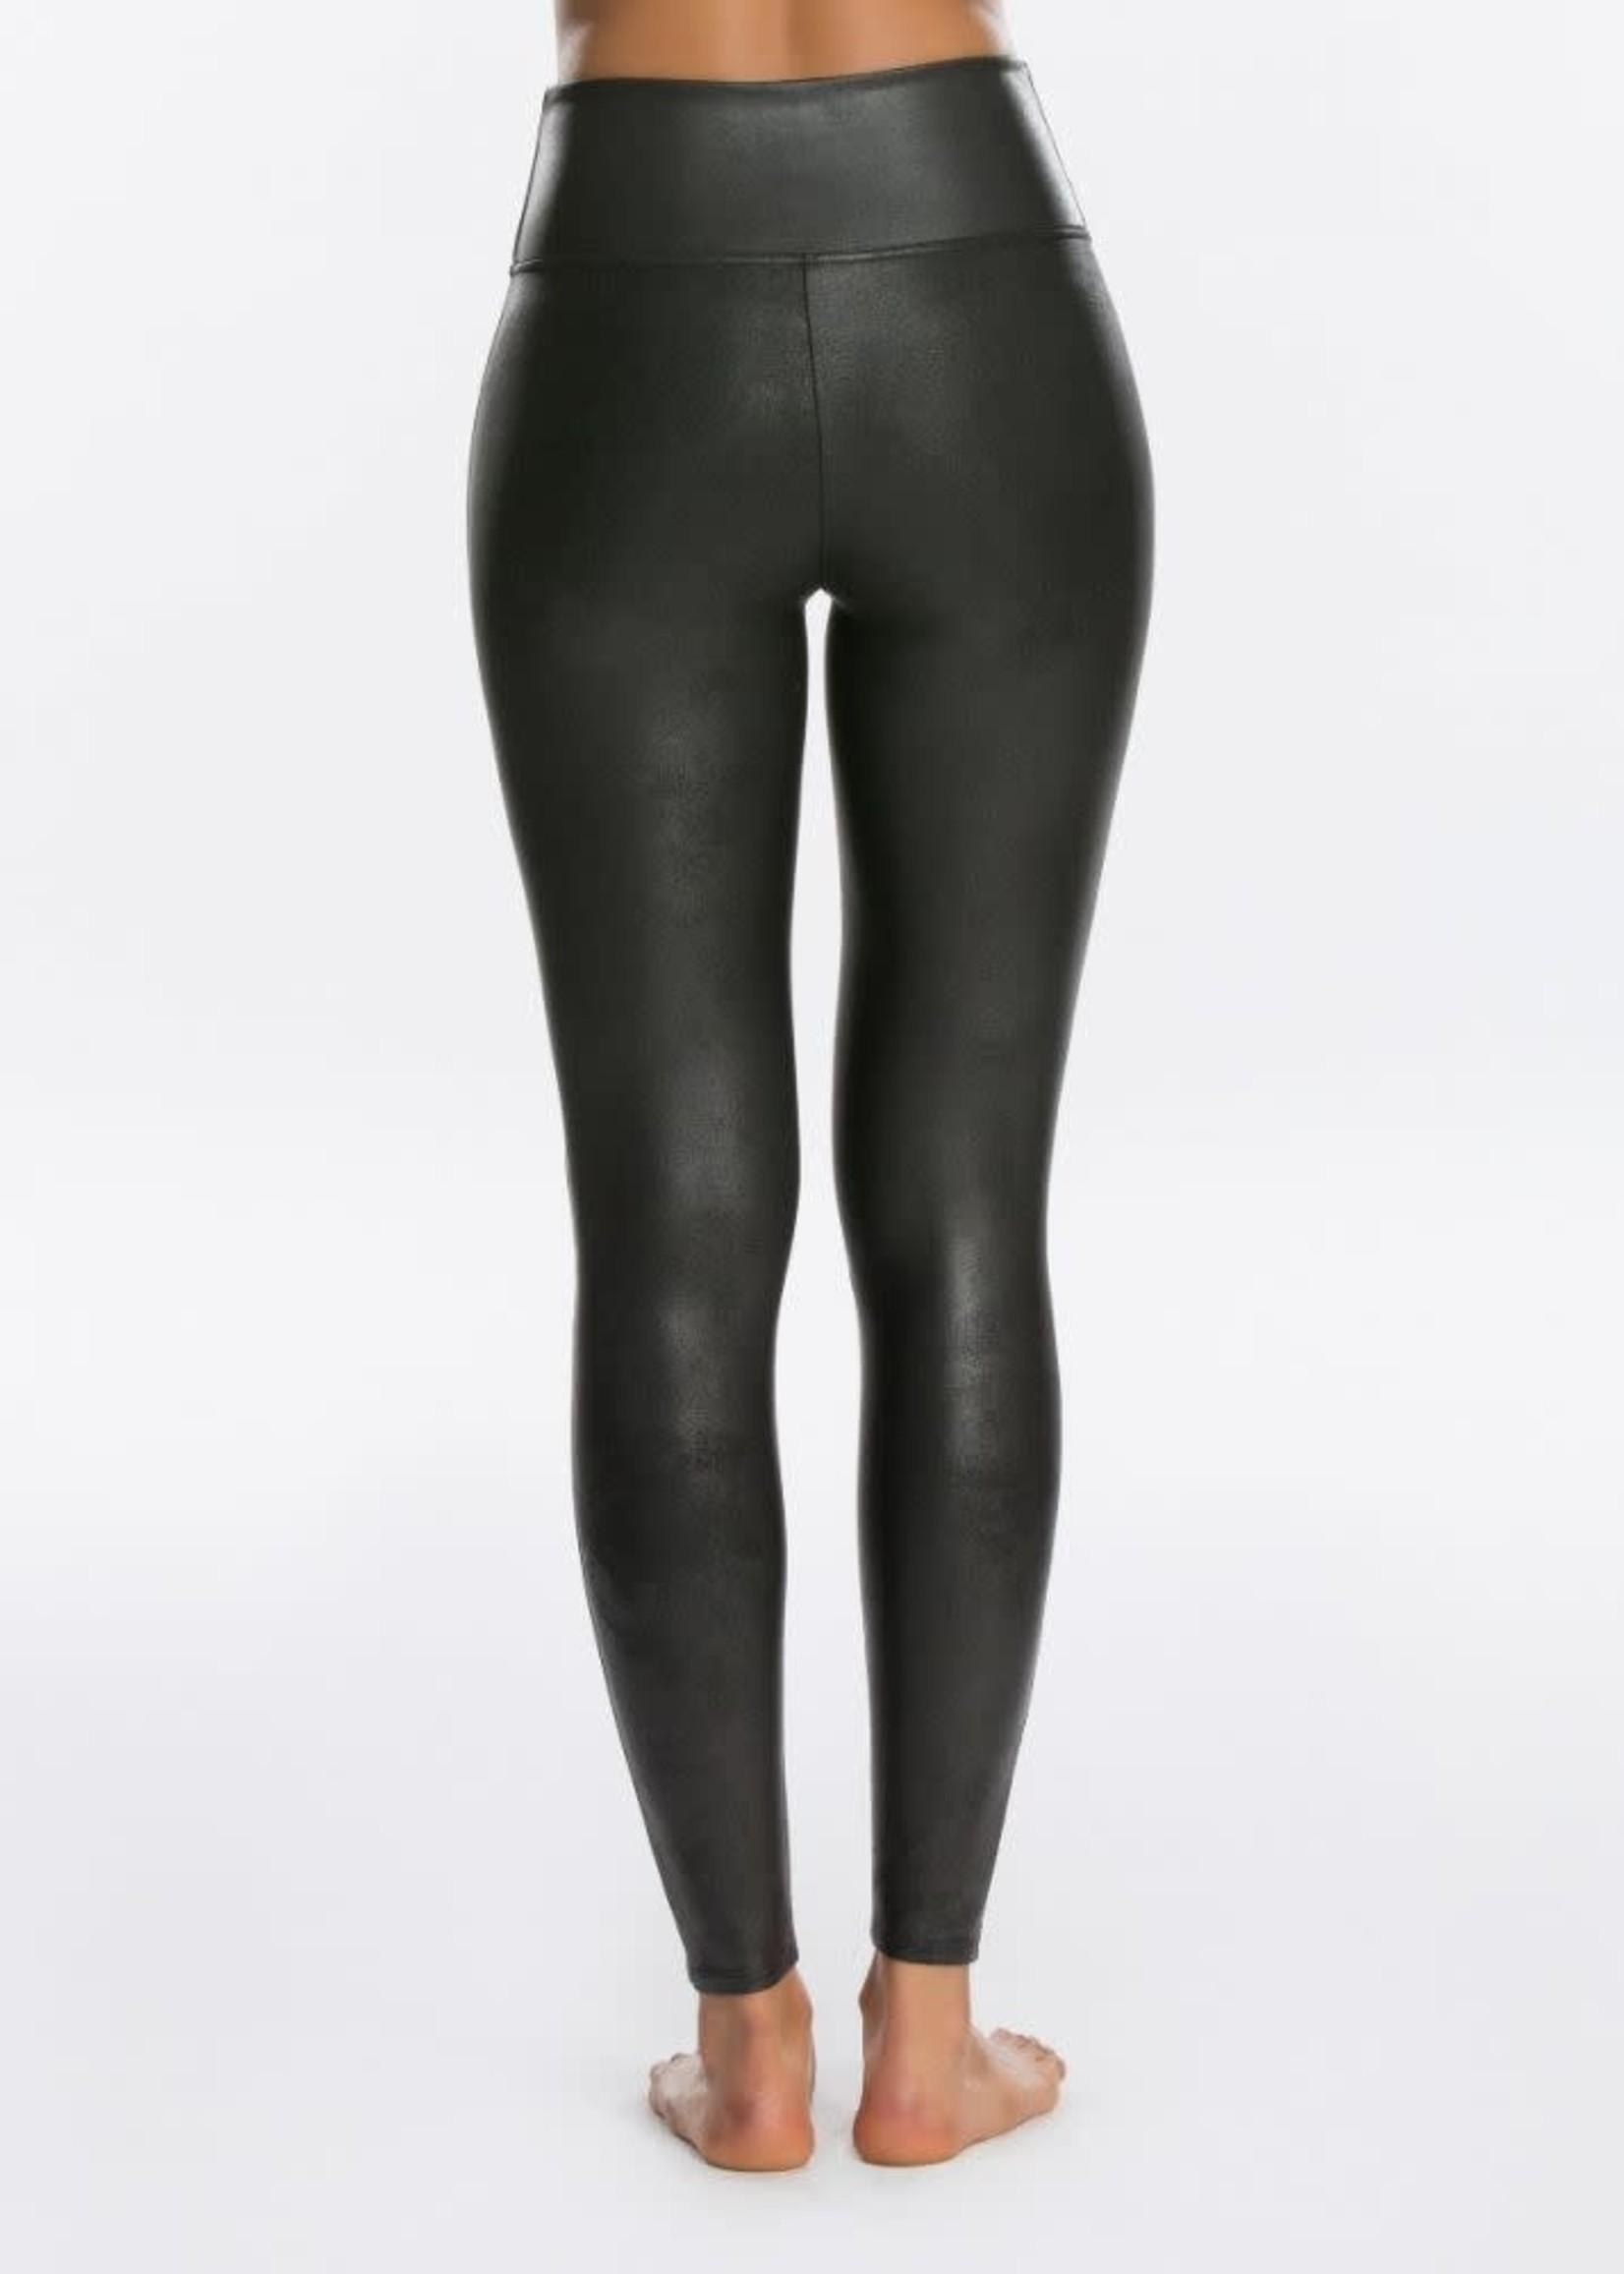 Spanx Faux Leather Legging